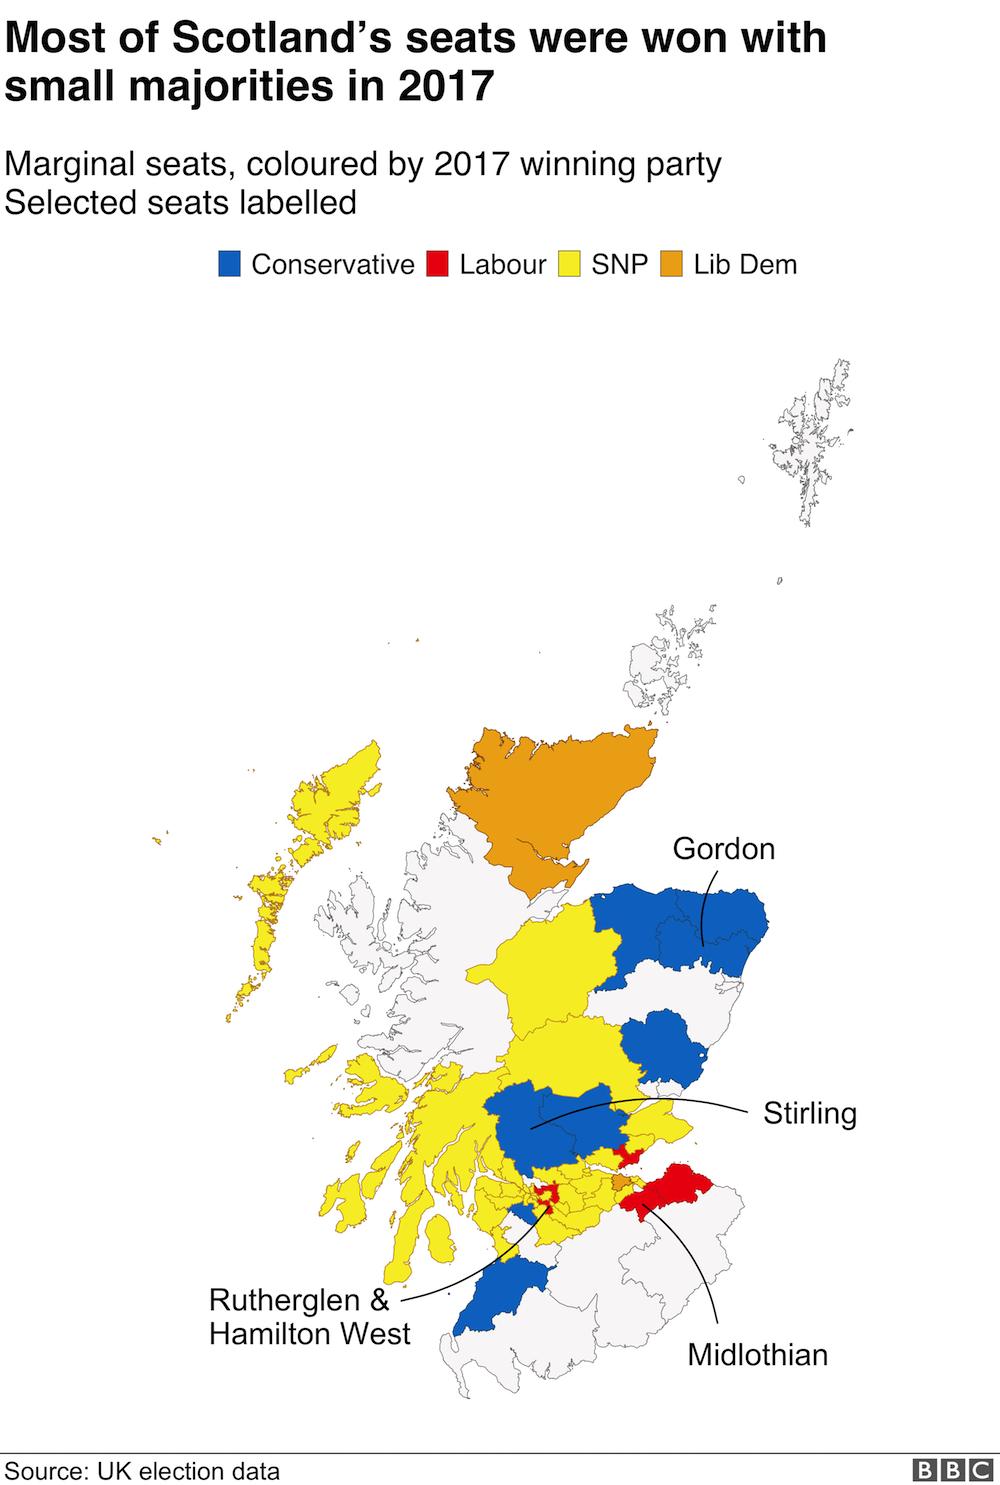 Scotland's marginal seats